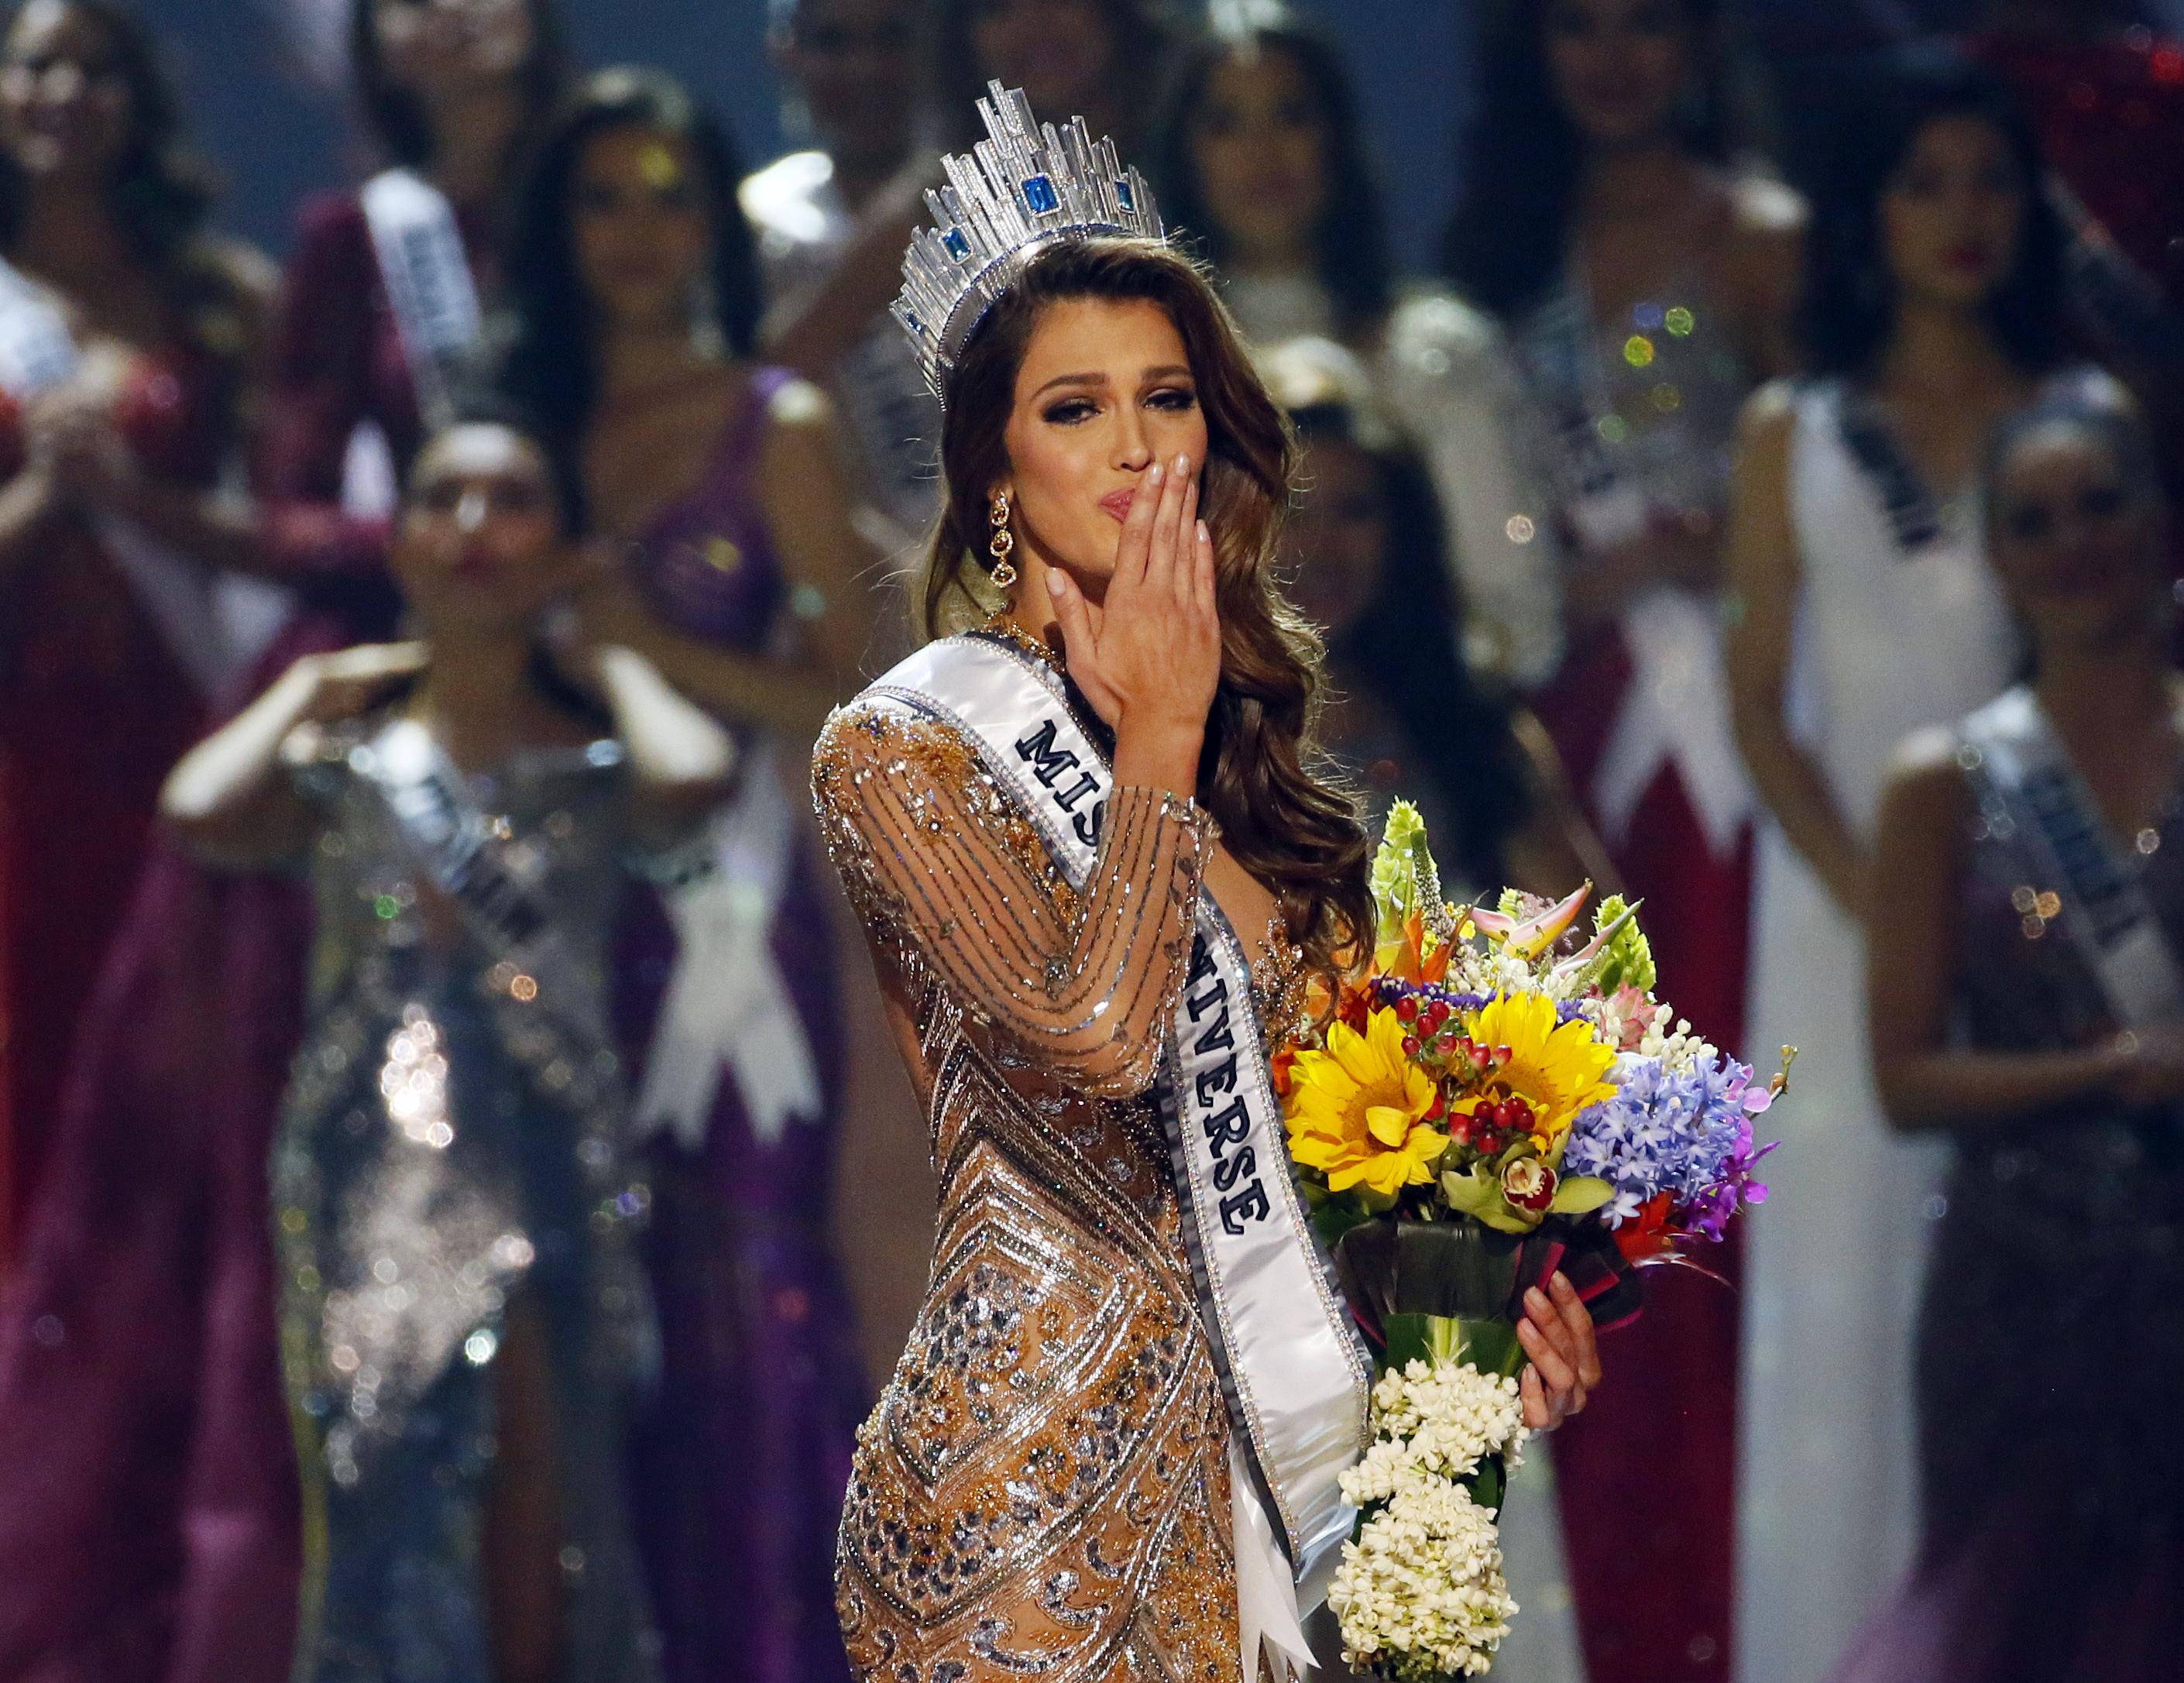 Frantuzoaica Iris Mittenaere a fost aleasa Miss Univers. Cum arata cea mai frumoasa femeie din lume. GALERIE FOTO